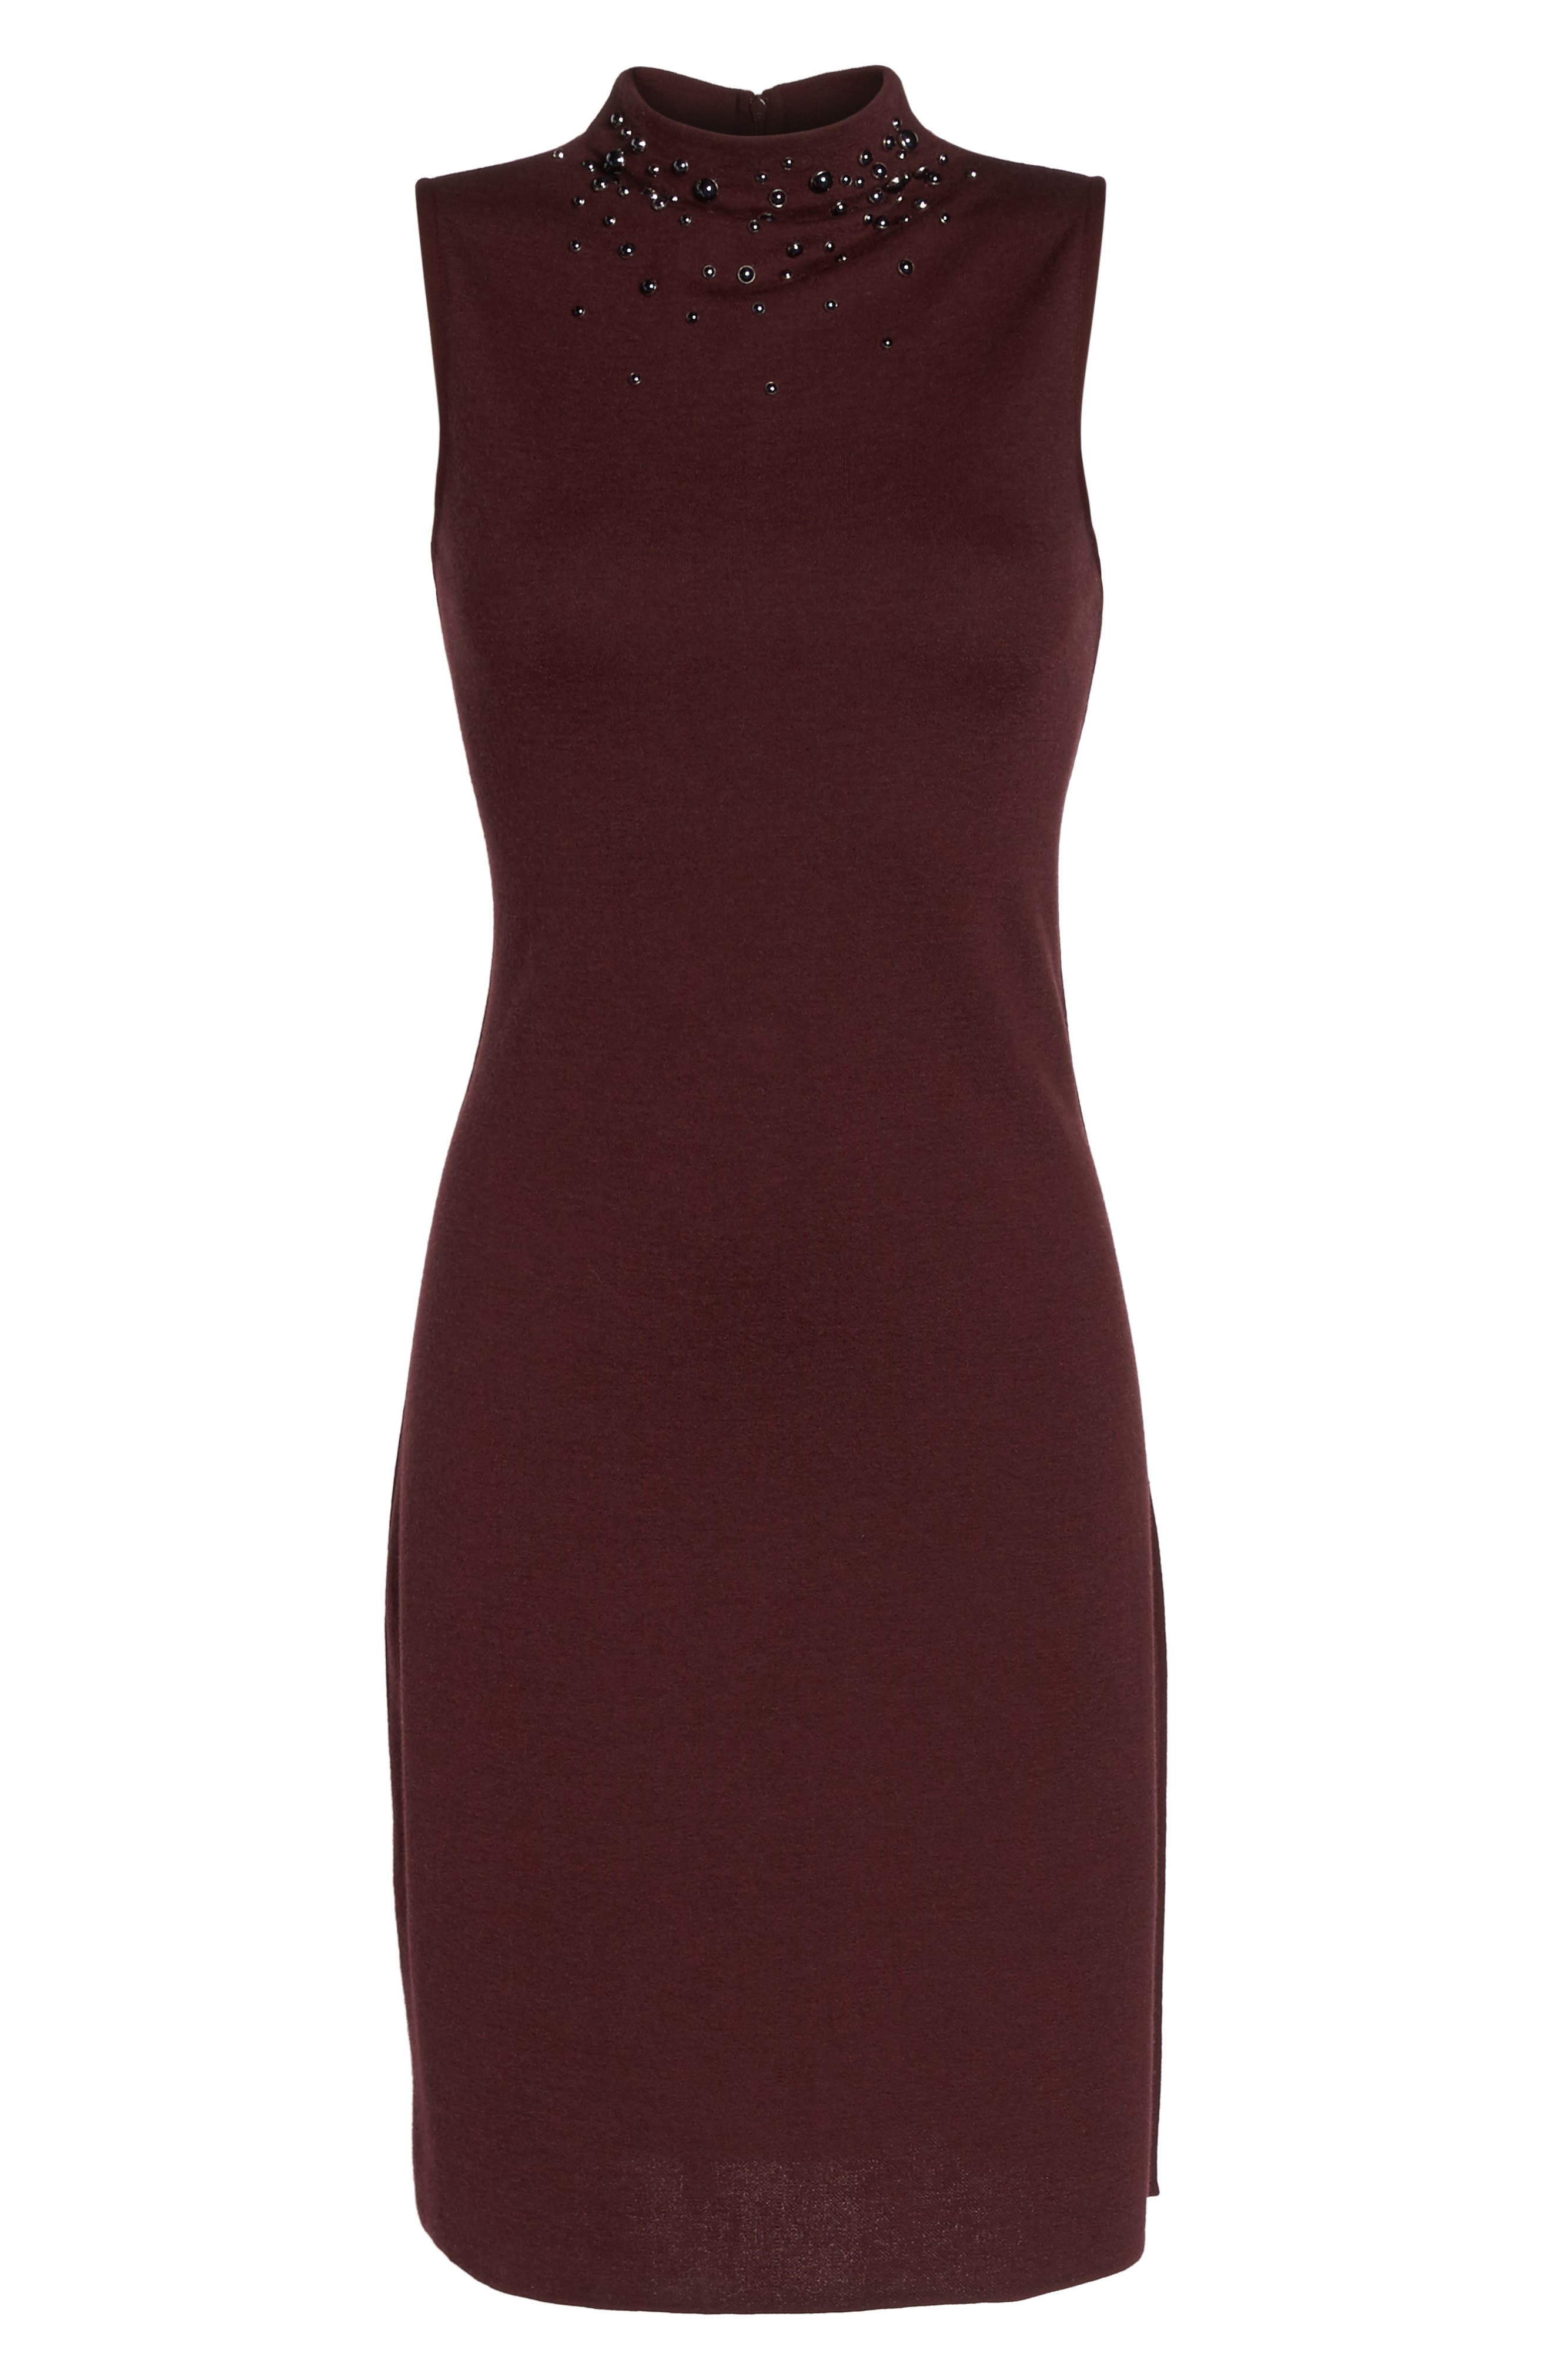 NIC + ZOE Falling Studs Embellished Sheath Dress,                             Alternate thumbnail 6, color,